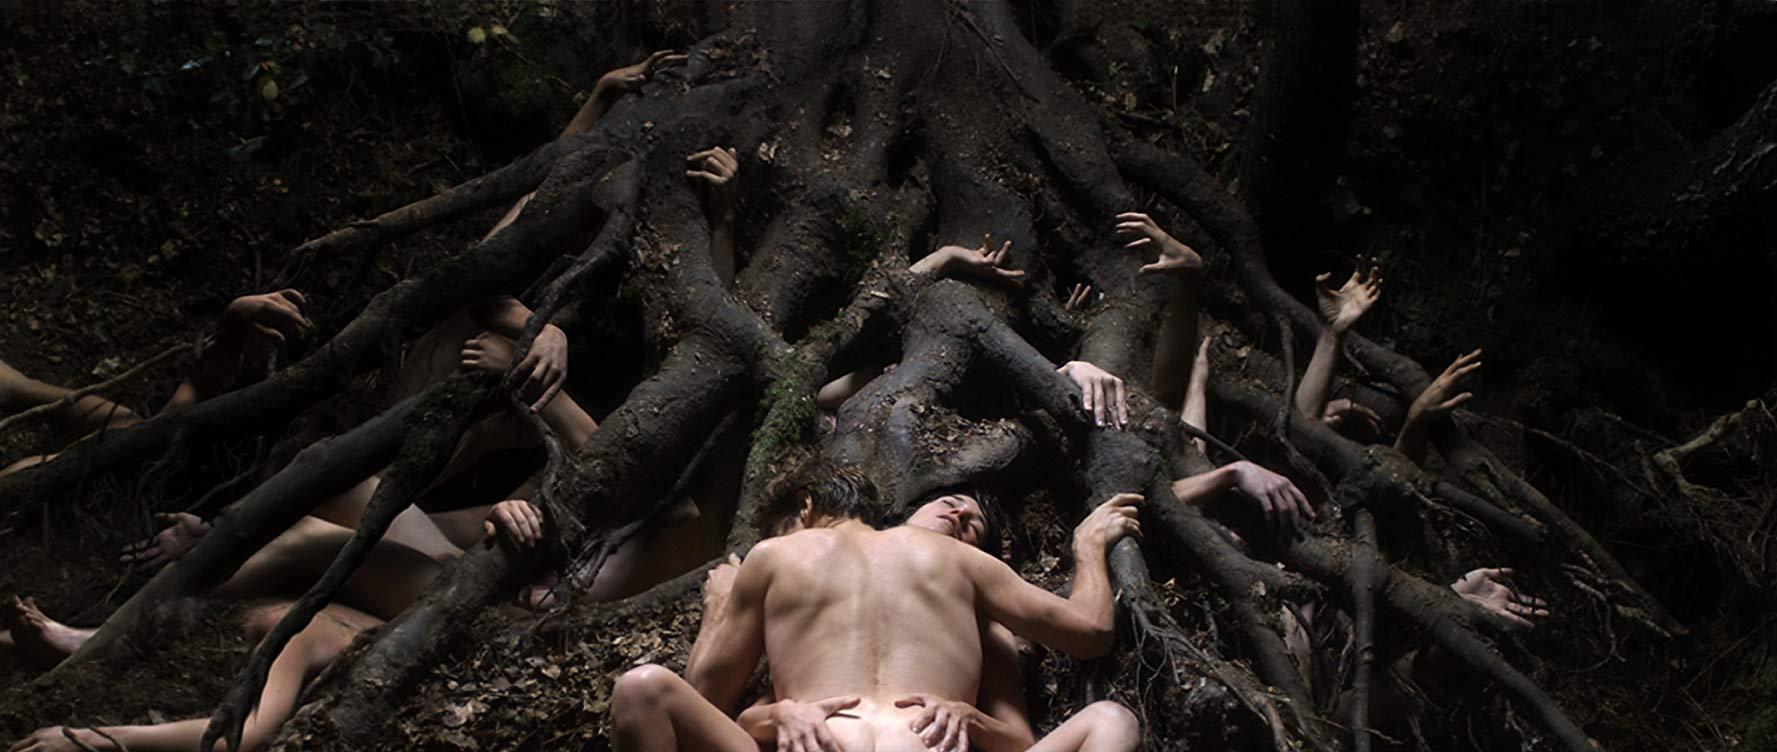 scenes-sexe-films-series-porno-antichrist